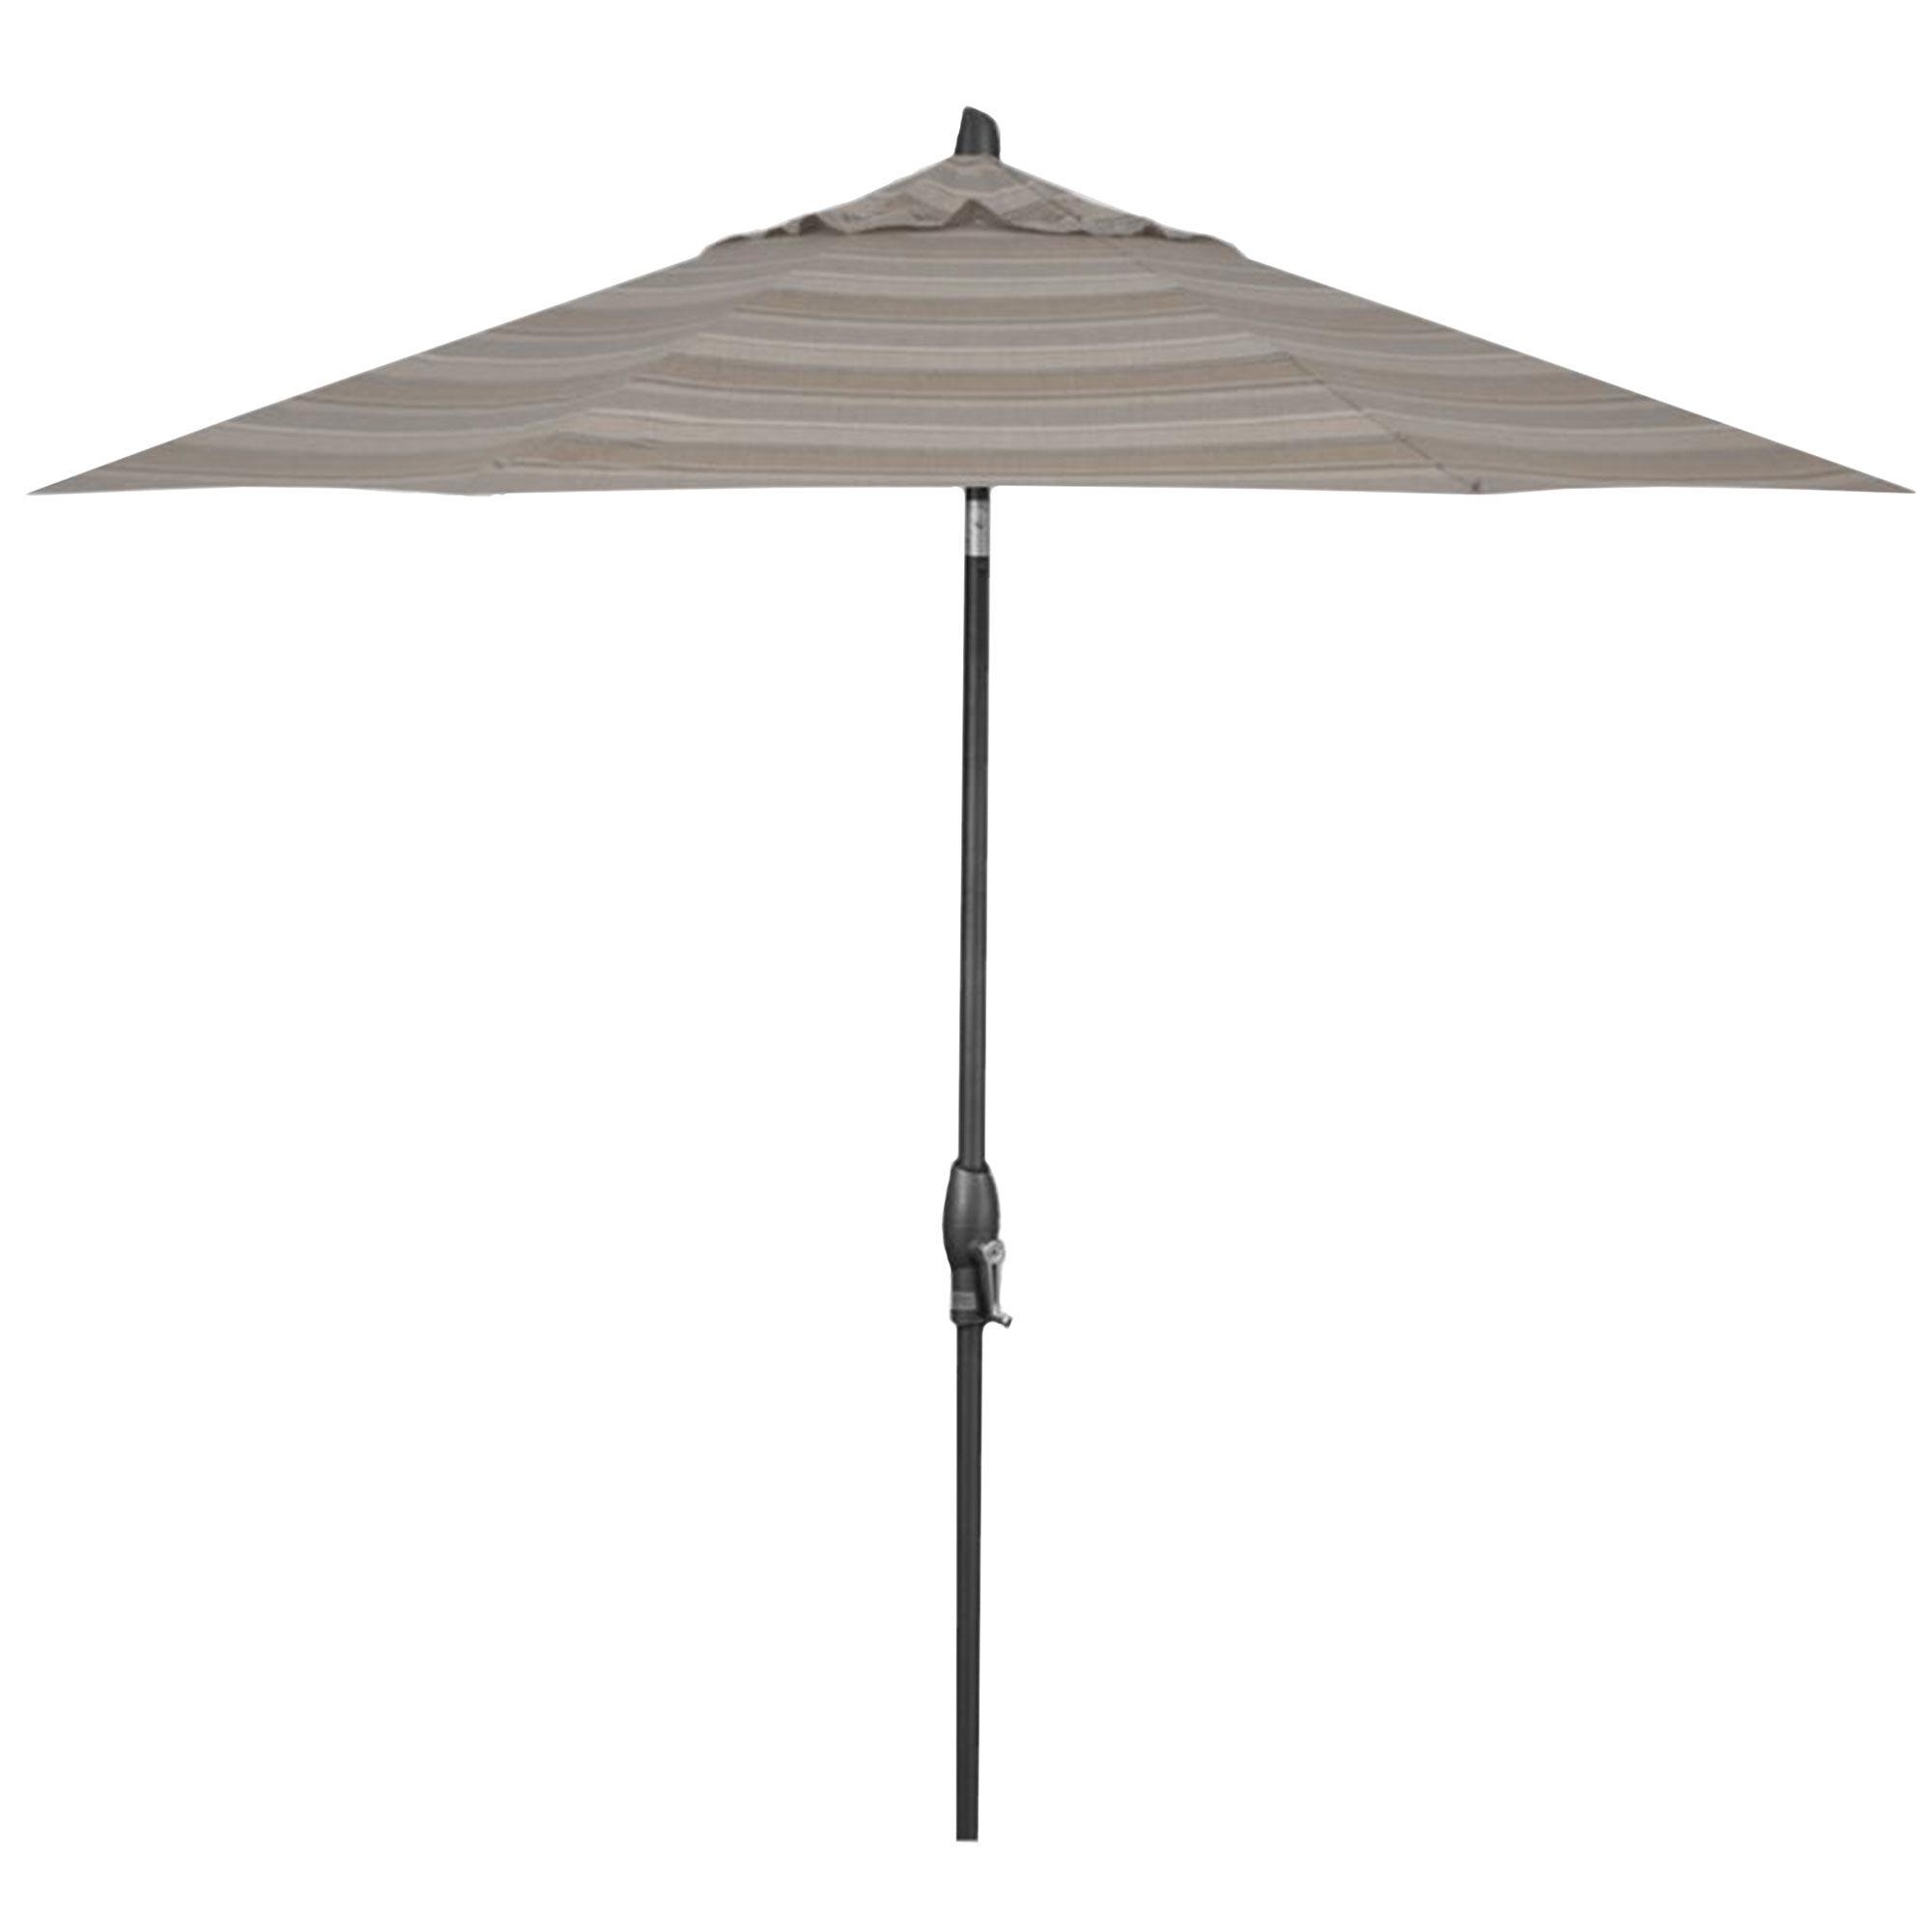 Treasure Garden 9' Auto Tilt Trusted Fog Stripe Octagon Umbrella  - Anthracite/Trusted Fog Stripe - Size: One Size